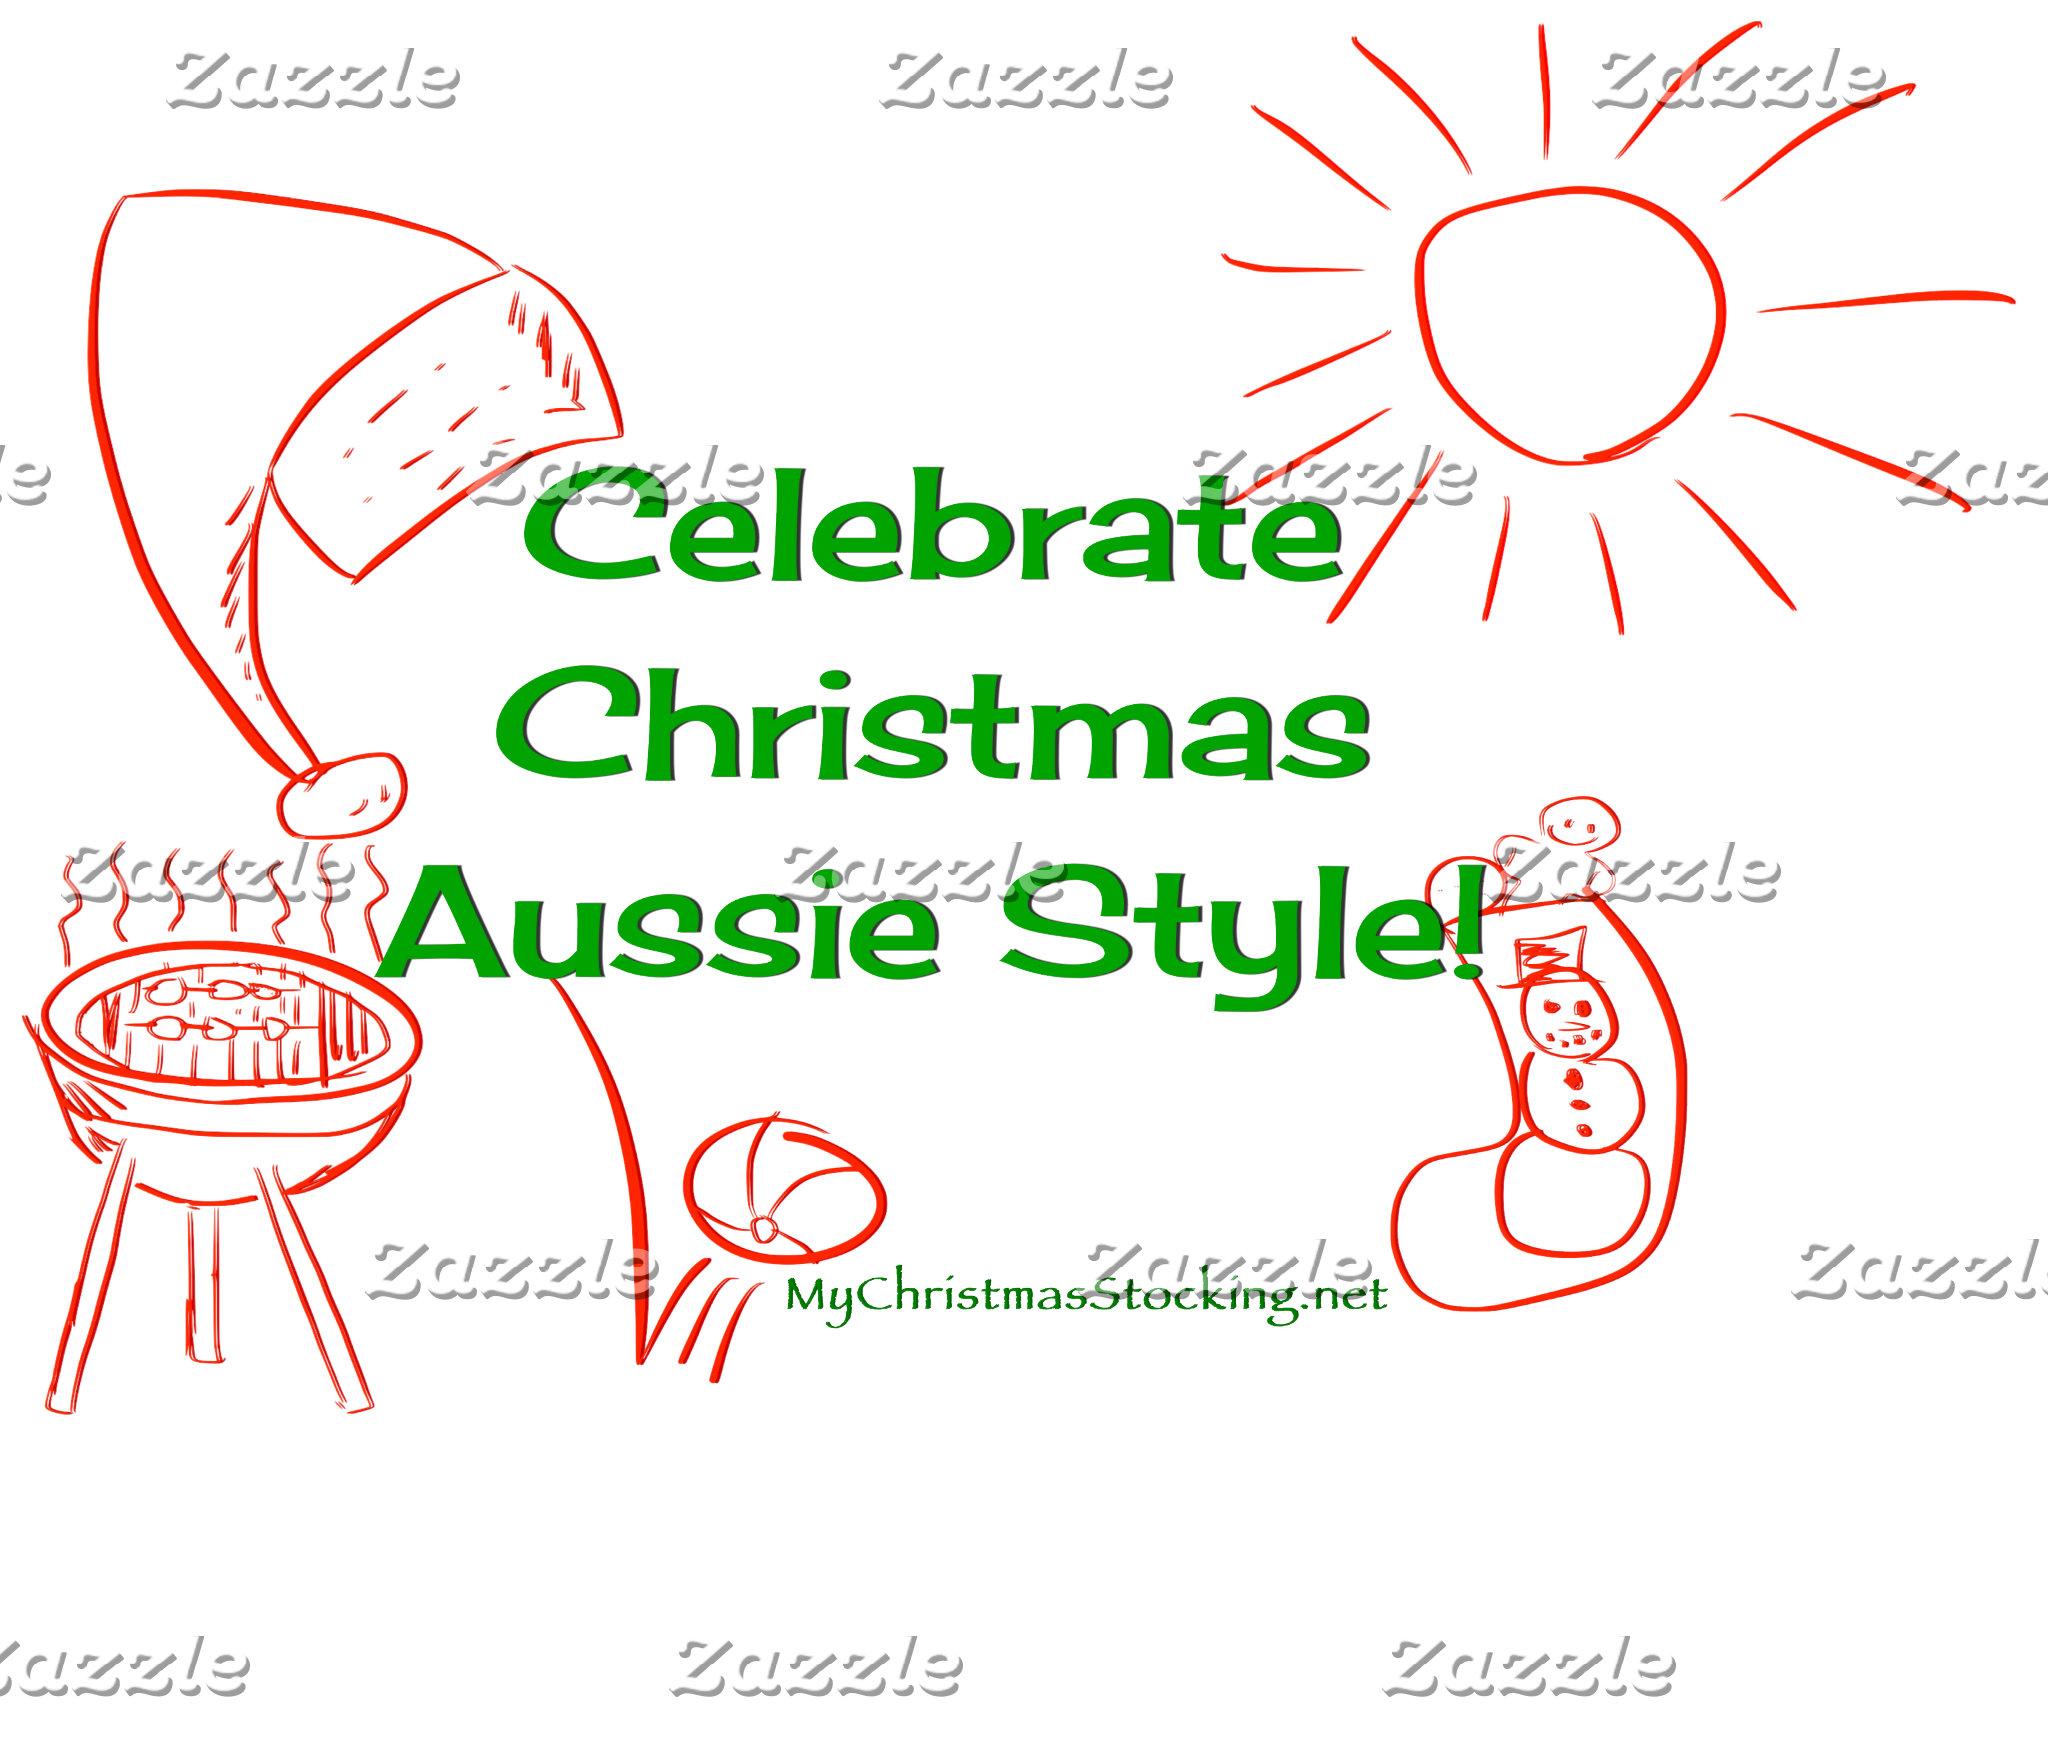 Celebrate Christmas Aussie Style!